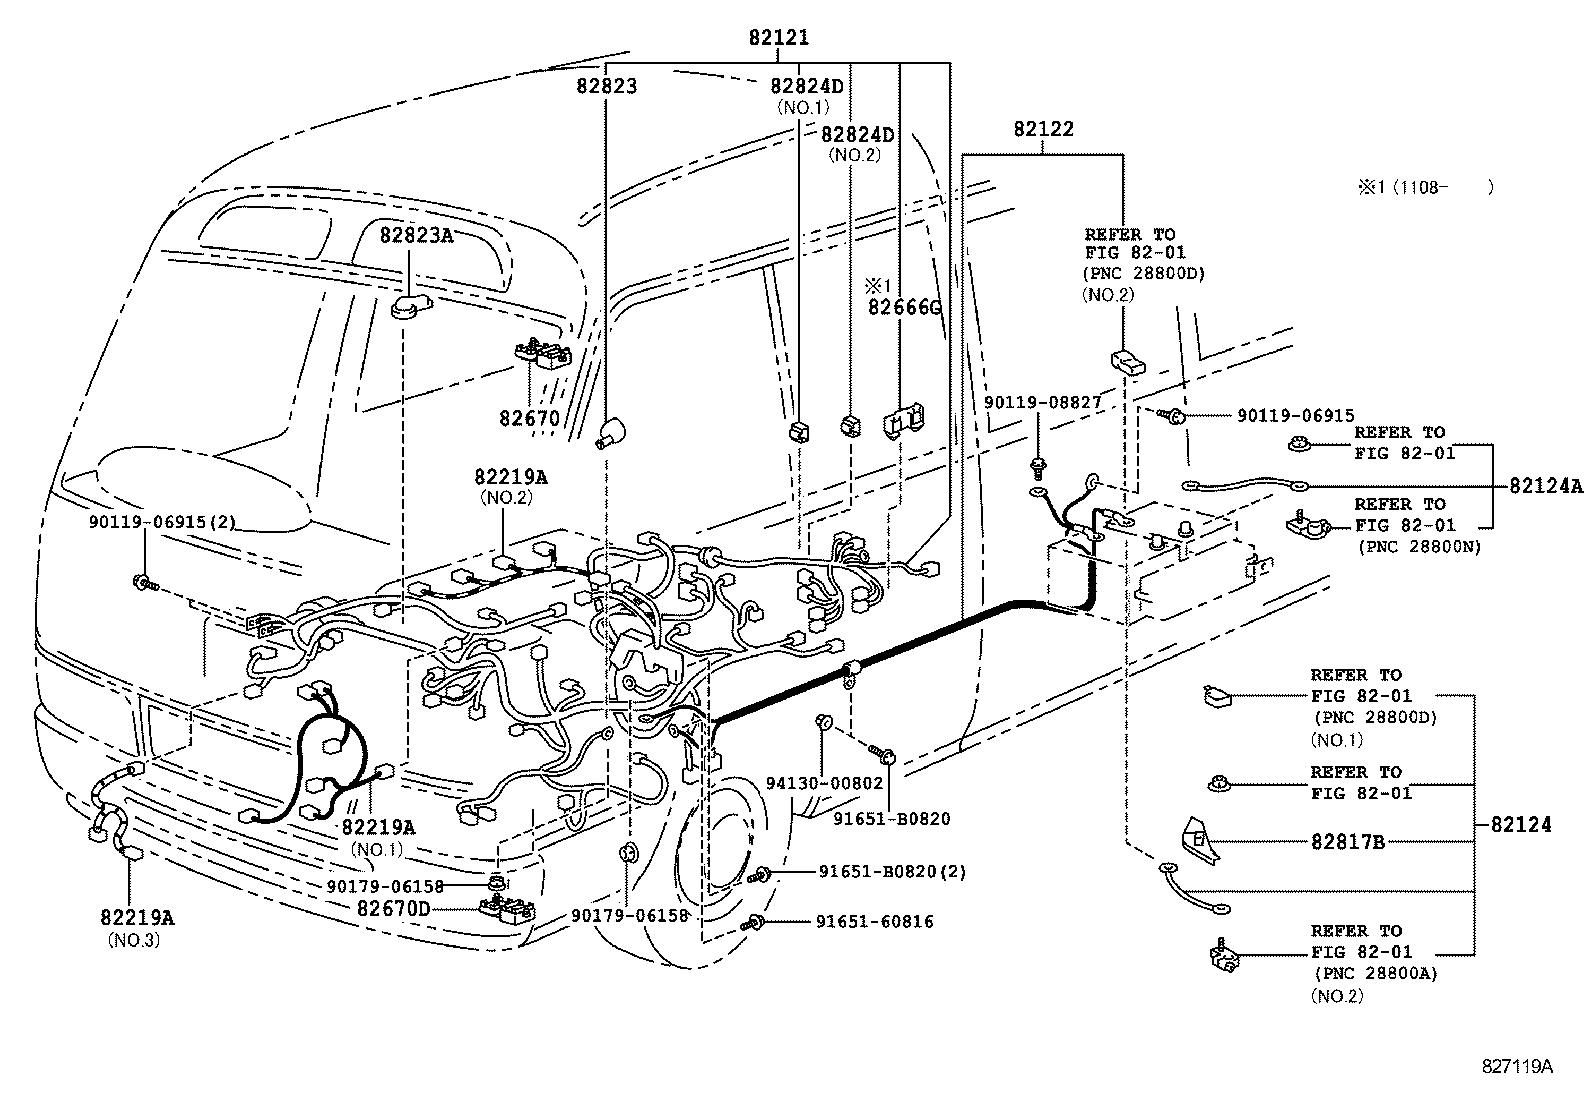 Toyota Coaster Bus Wiring Diagram Explained Diagrams Tacoma Harness Clamp Electrical Car Fuse Box U2022